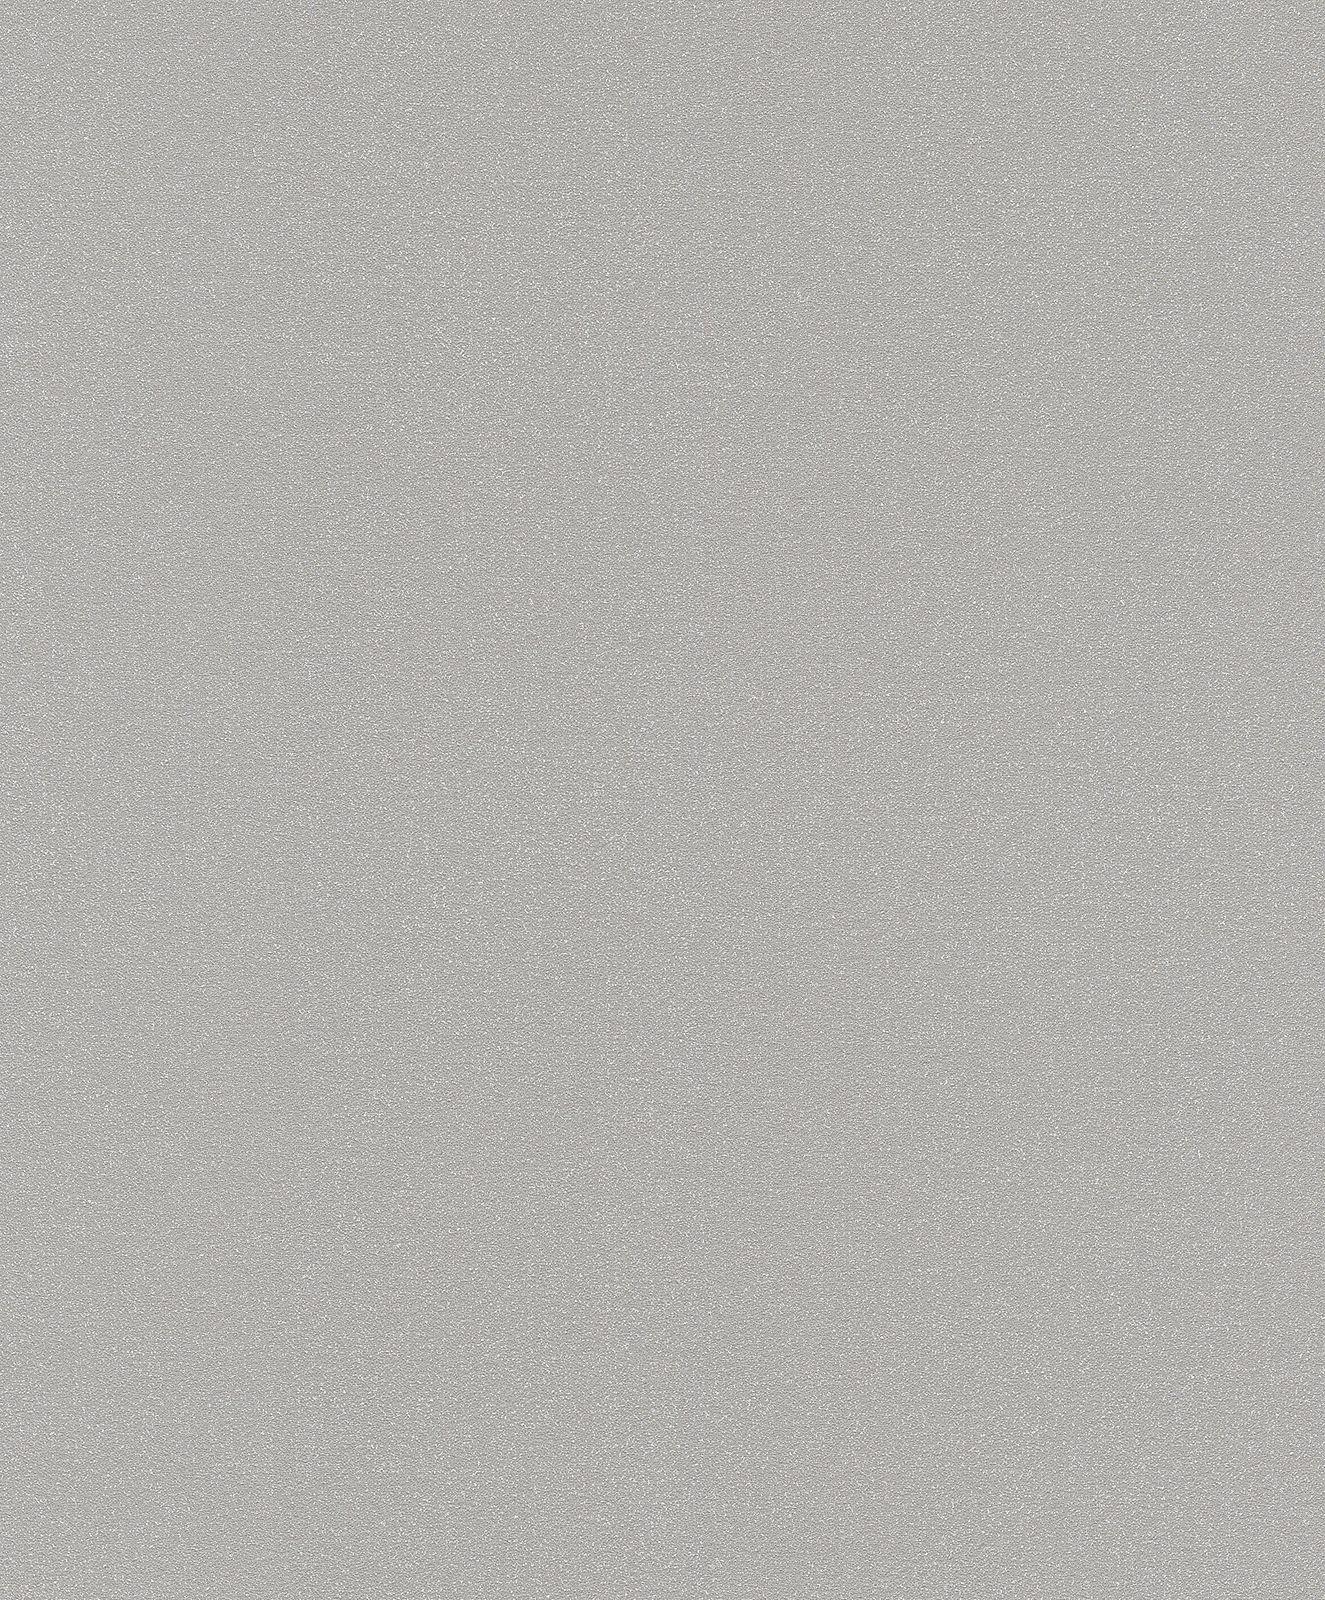 vliestapete rasch glimmer grau silber glitzer 898255. Black Bedroom Furniture Sets. Home Design Ideas